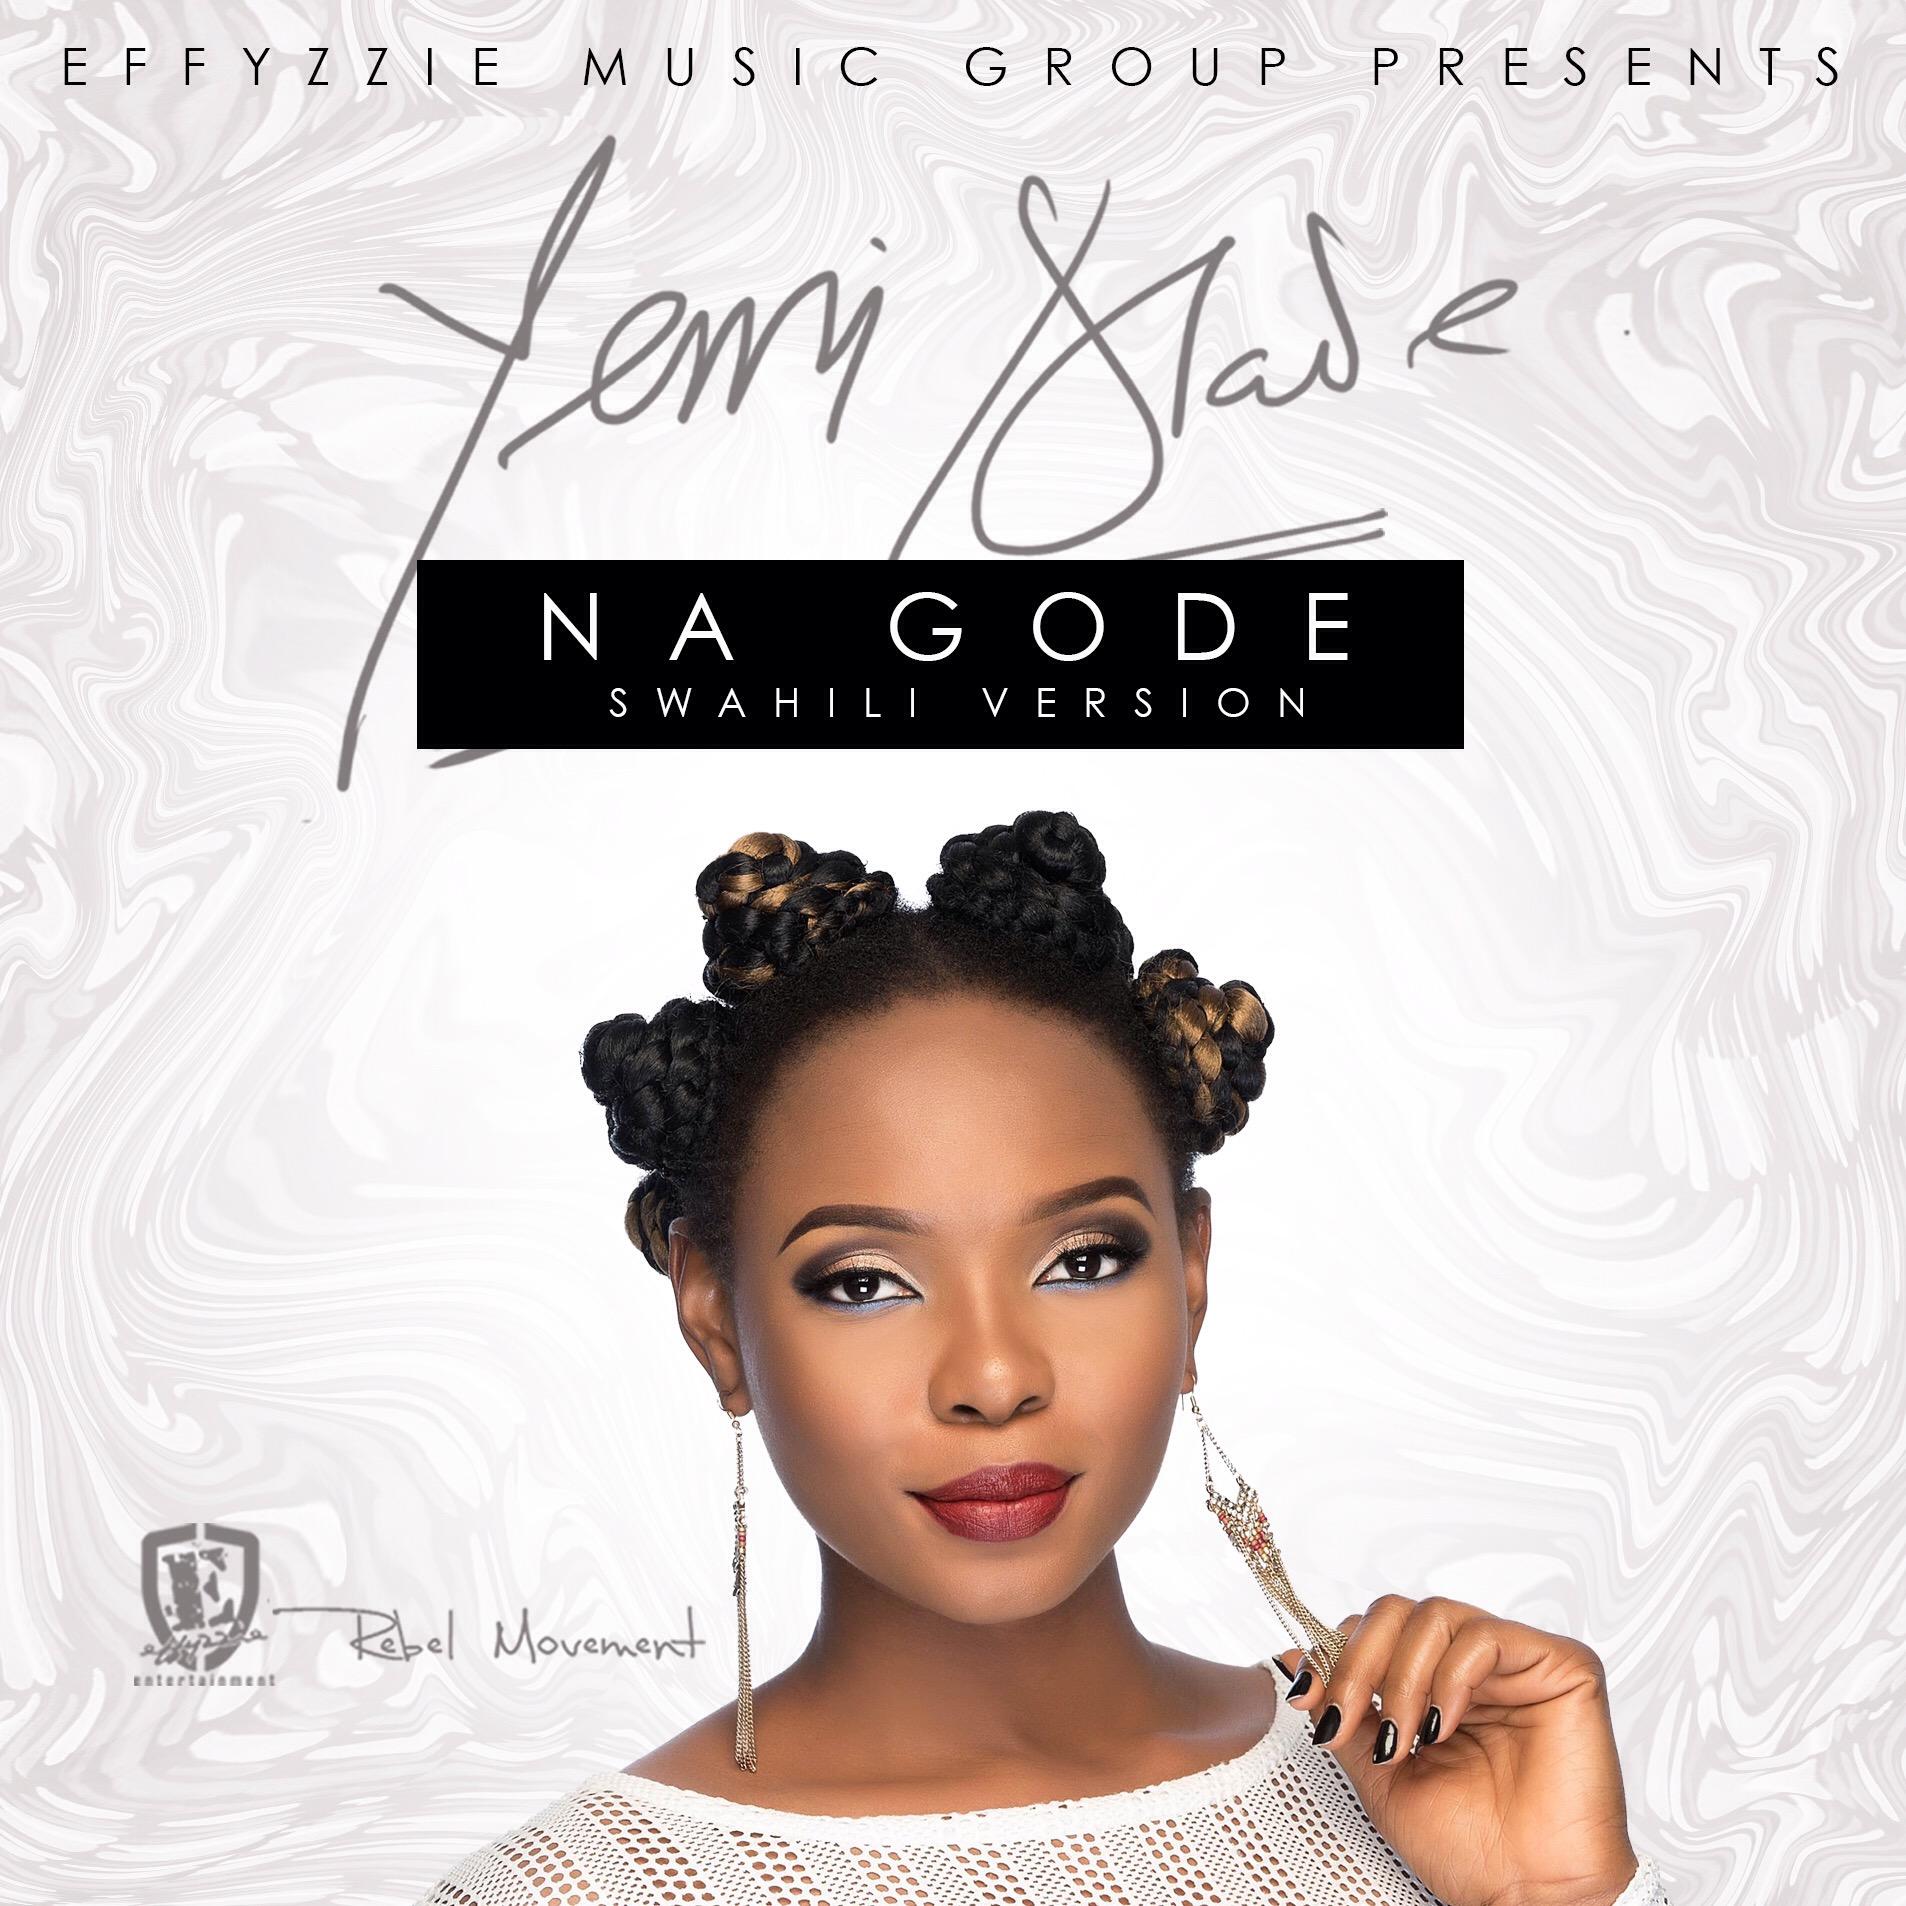 Yemi Alade – Na Gode (Swahili Version)